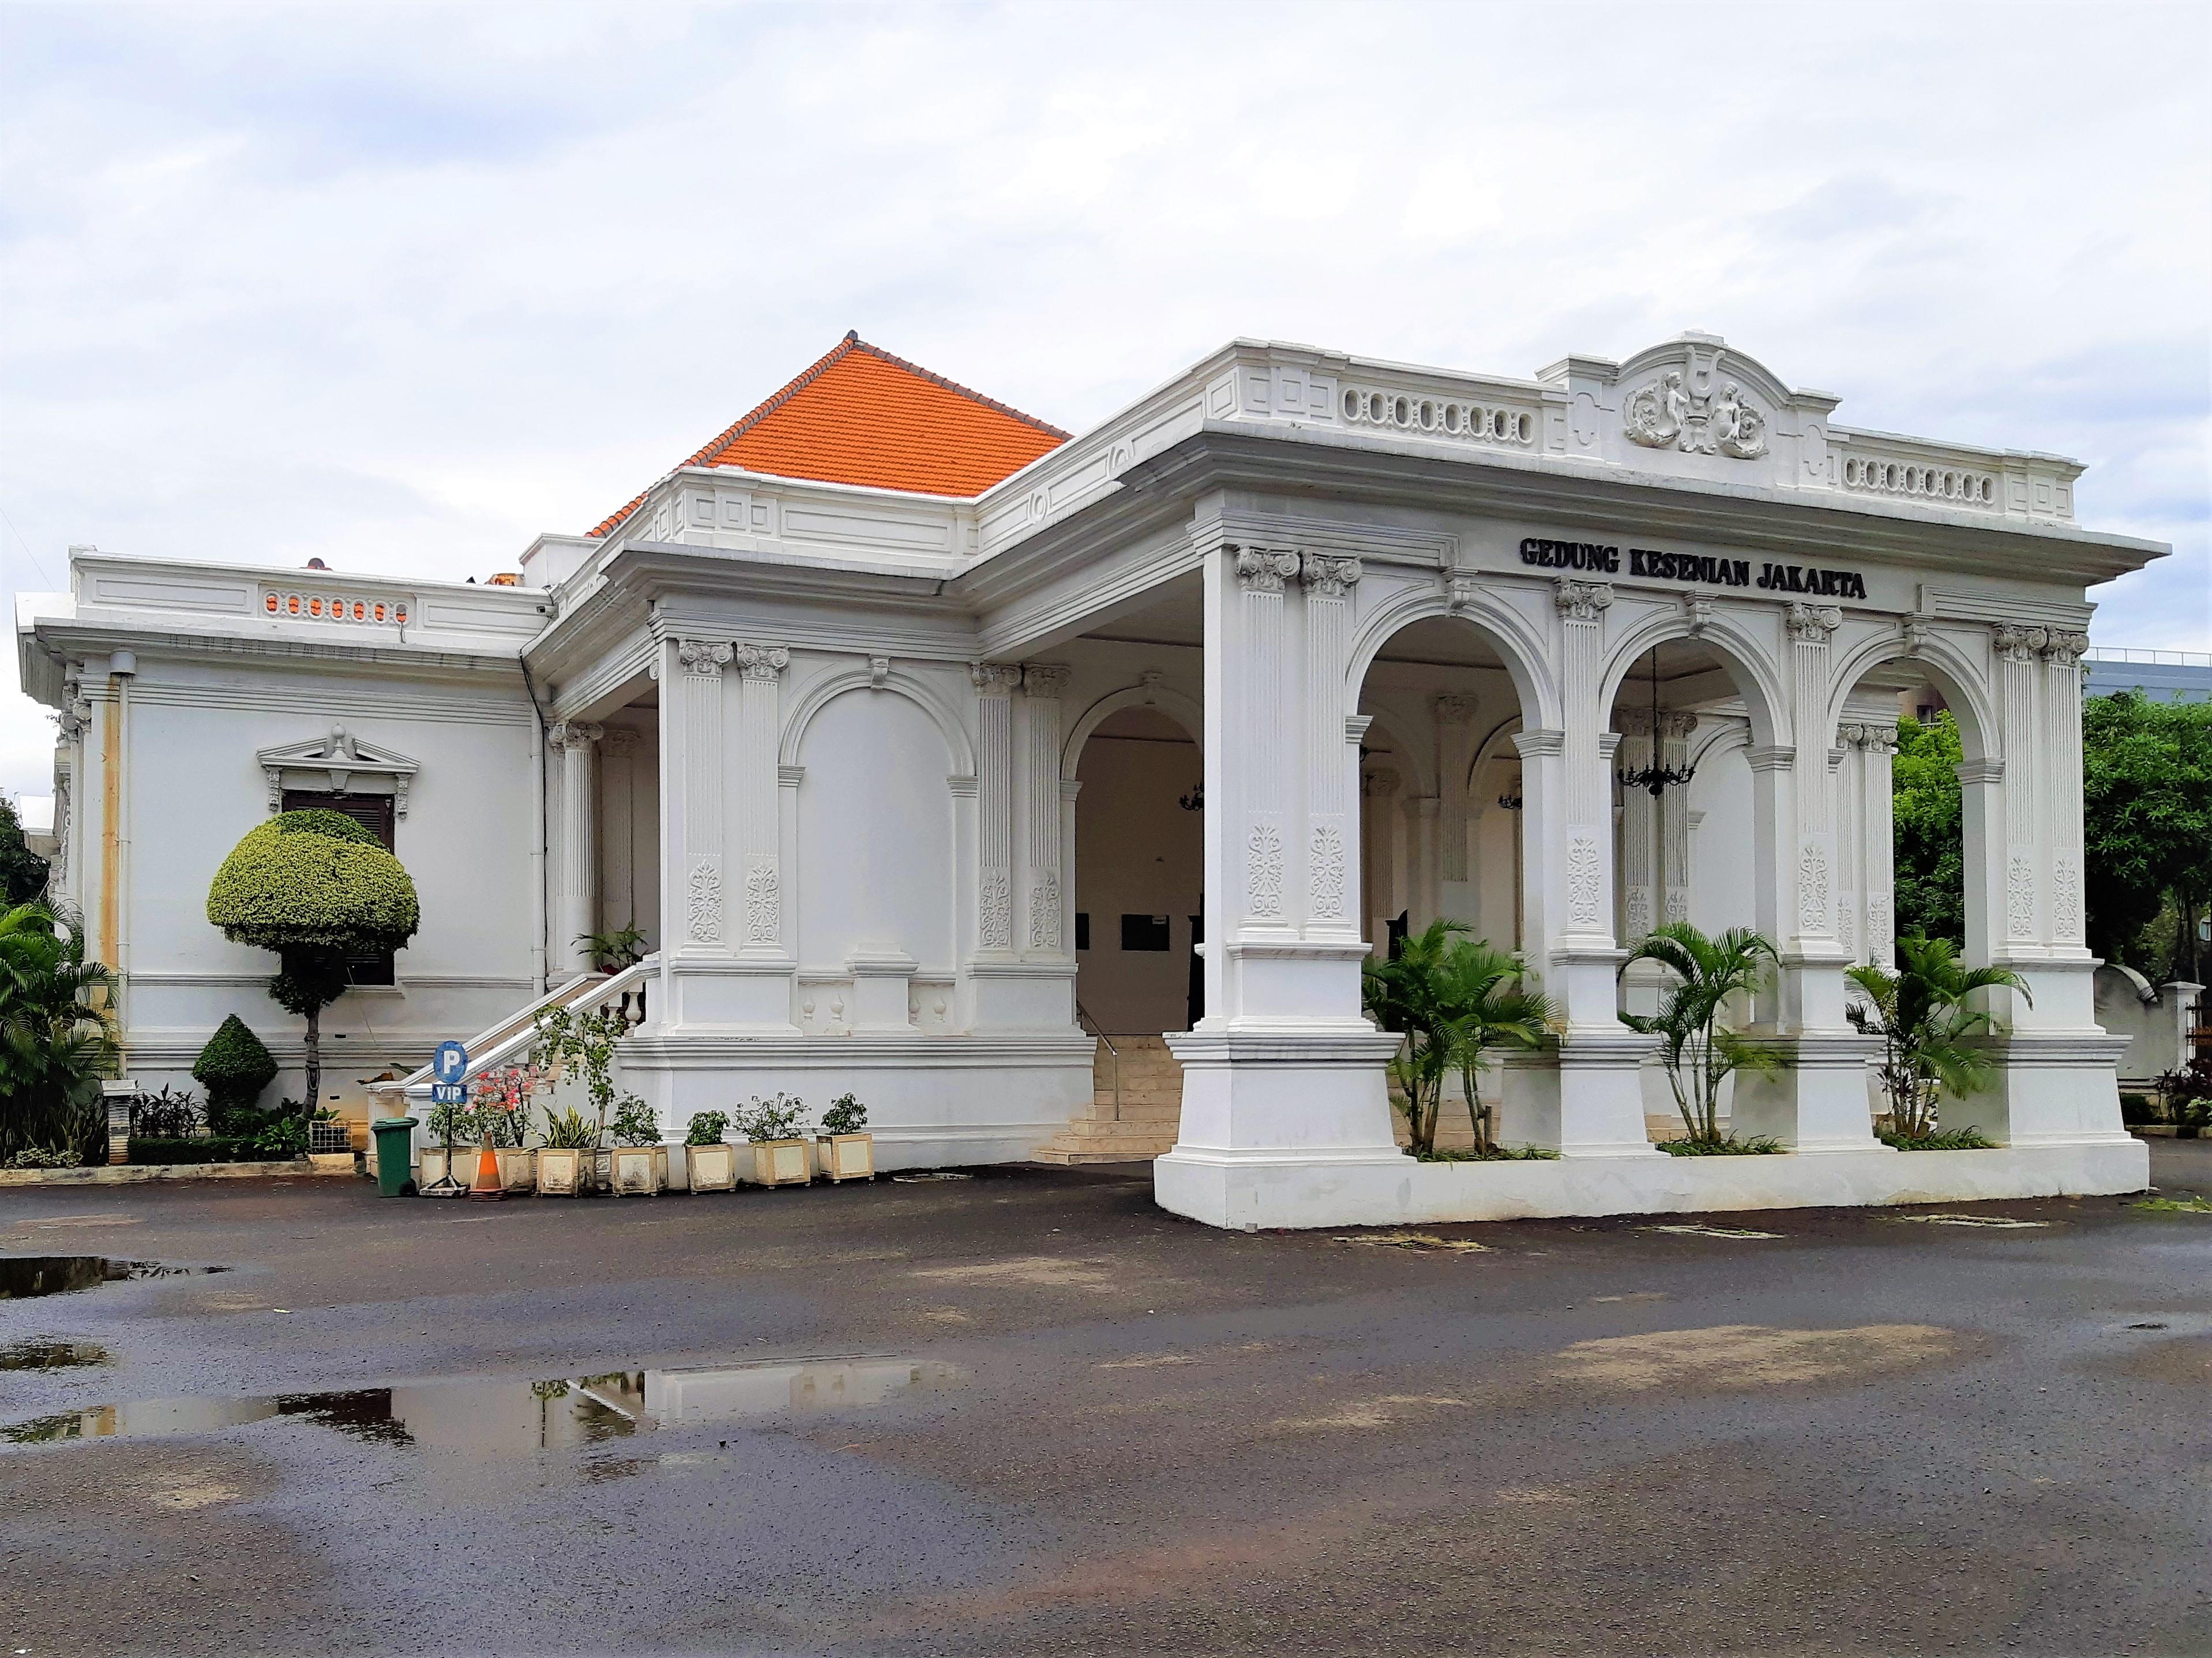 Gedung Kesenian Jakarta)